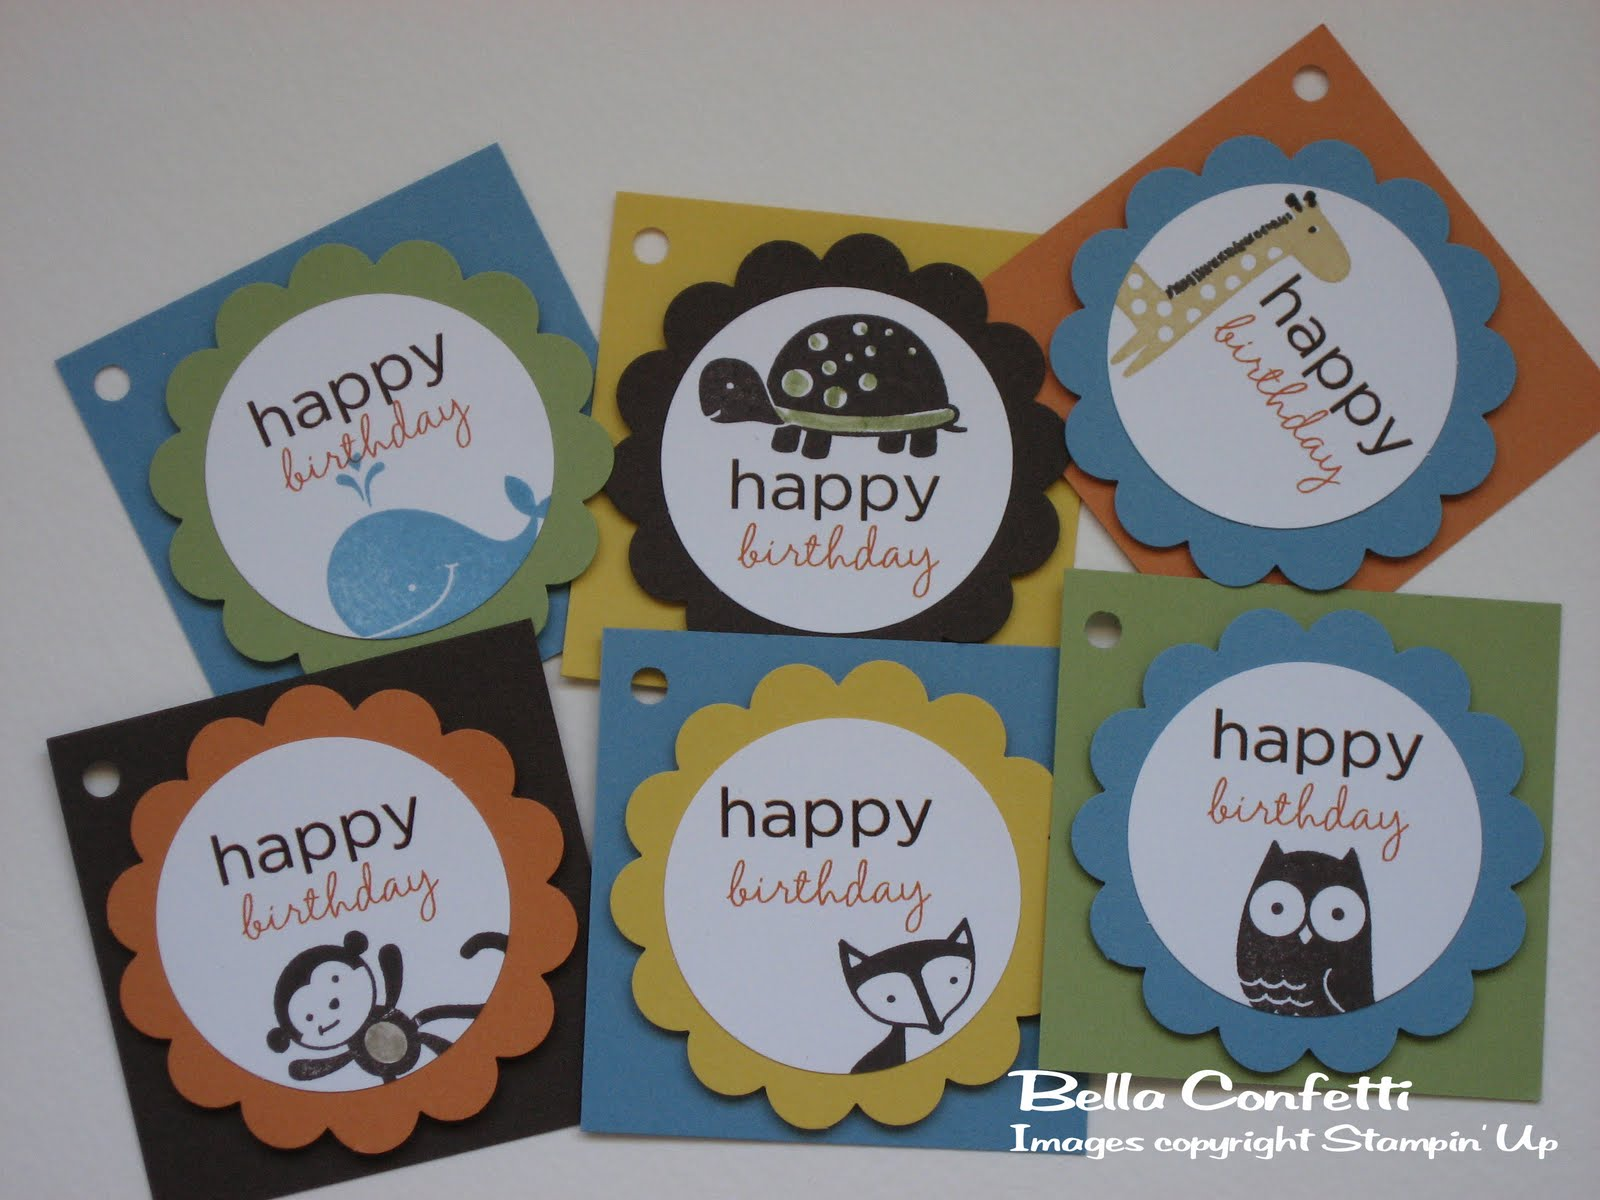 Birthday Tags: Bella Confetti: Children's Birthday Gift Tags